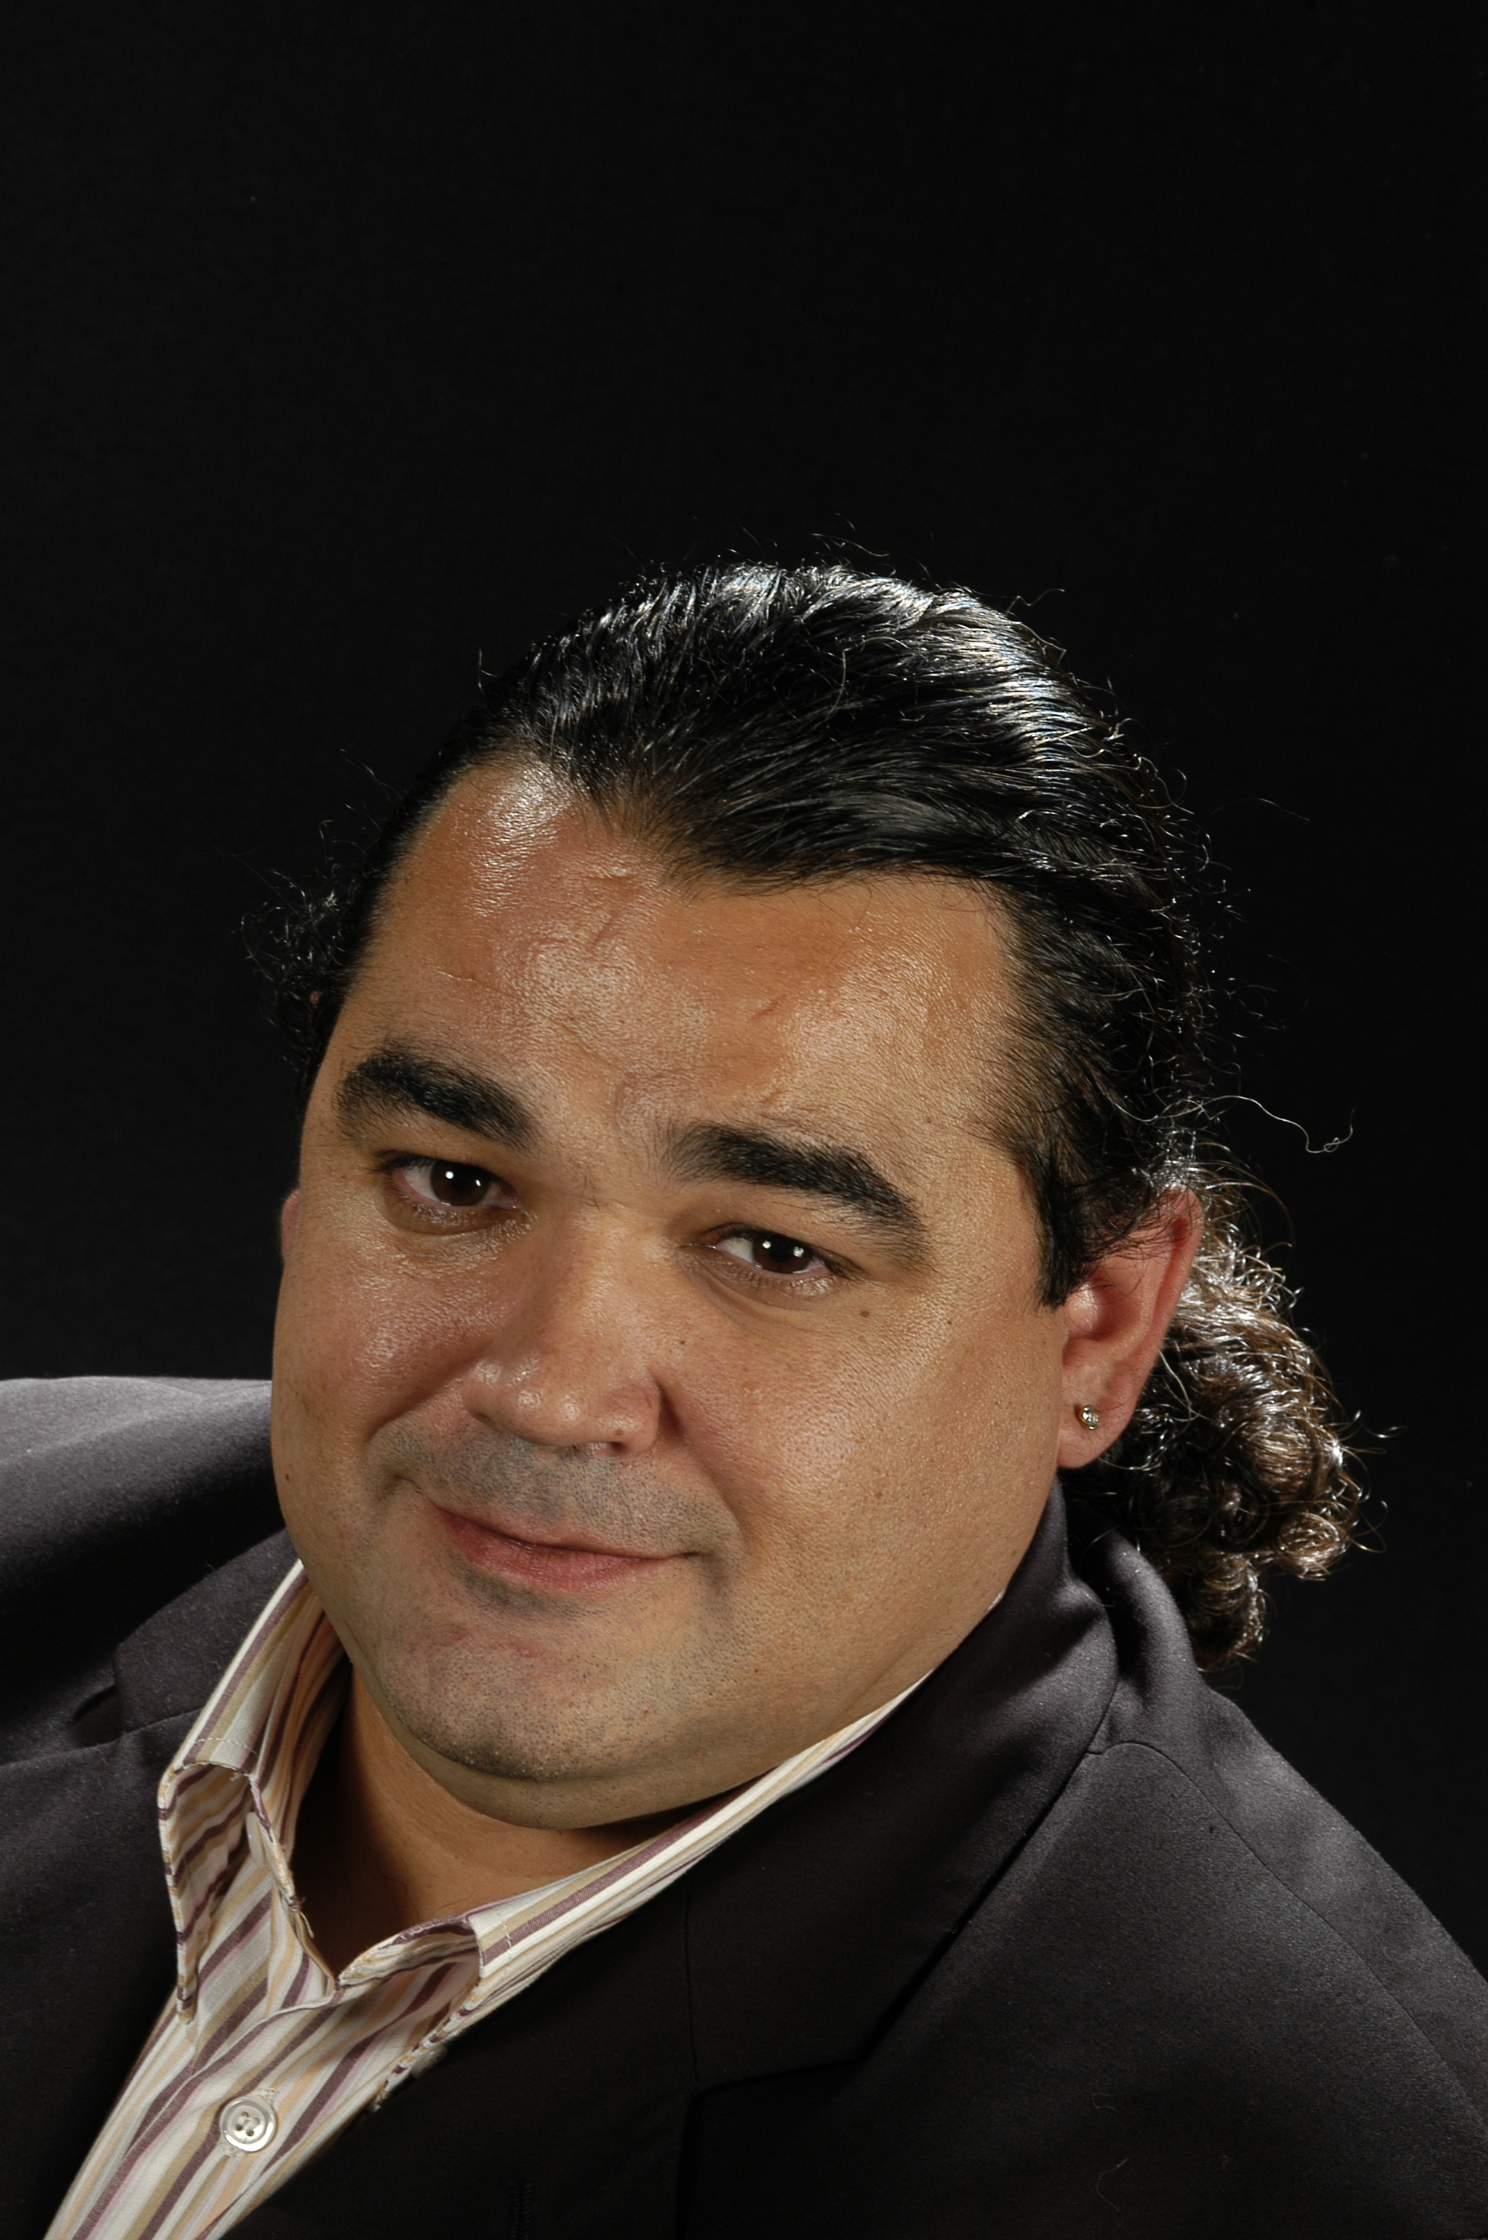 Sr. Jordi Pradell Buxó